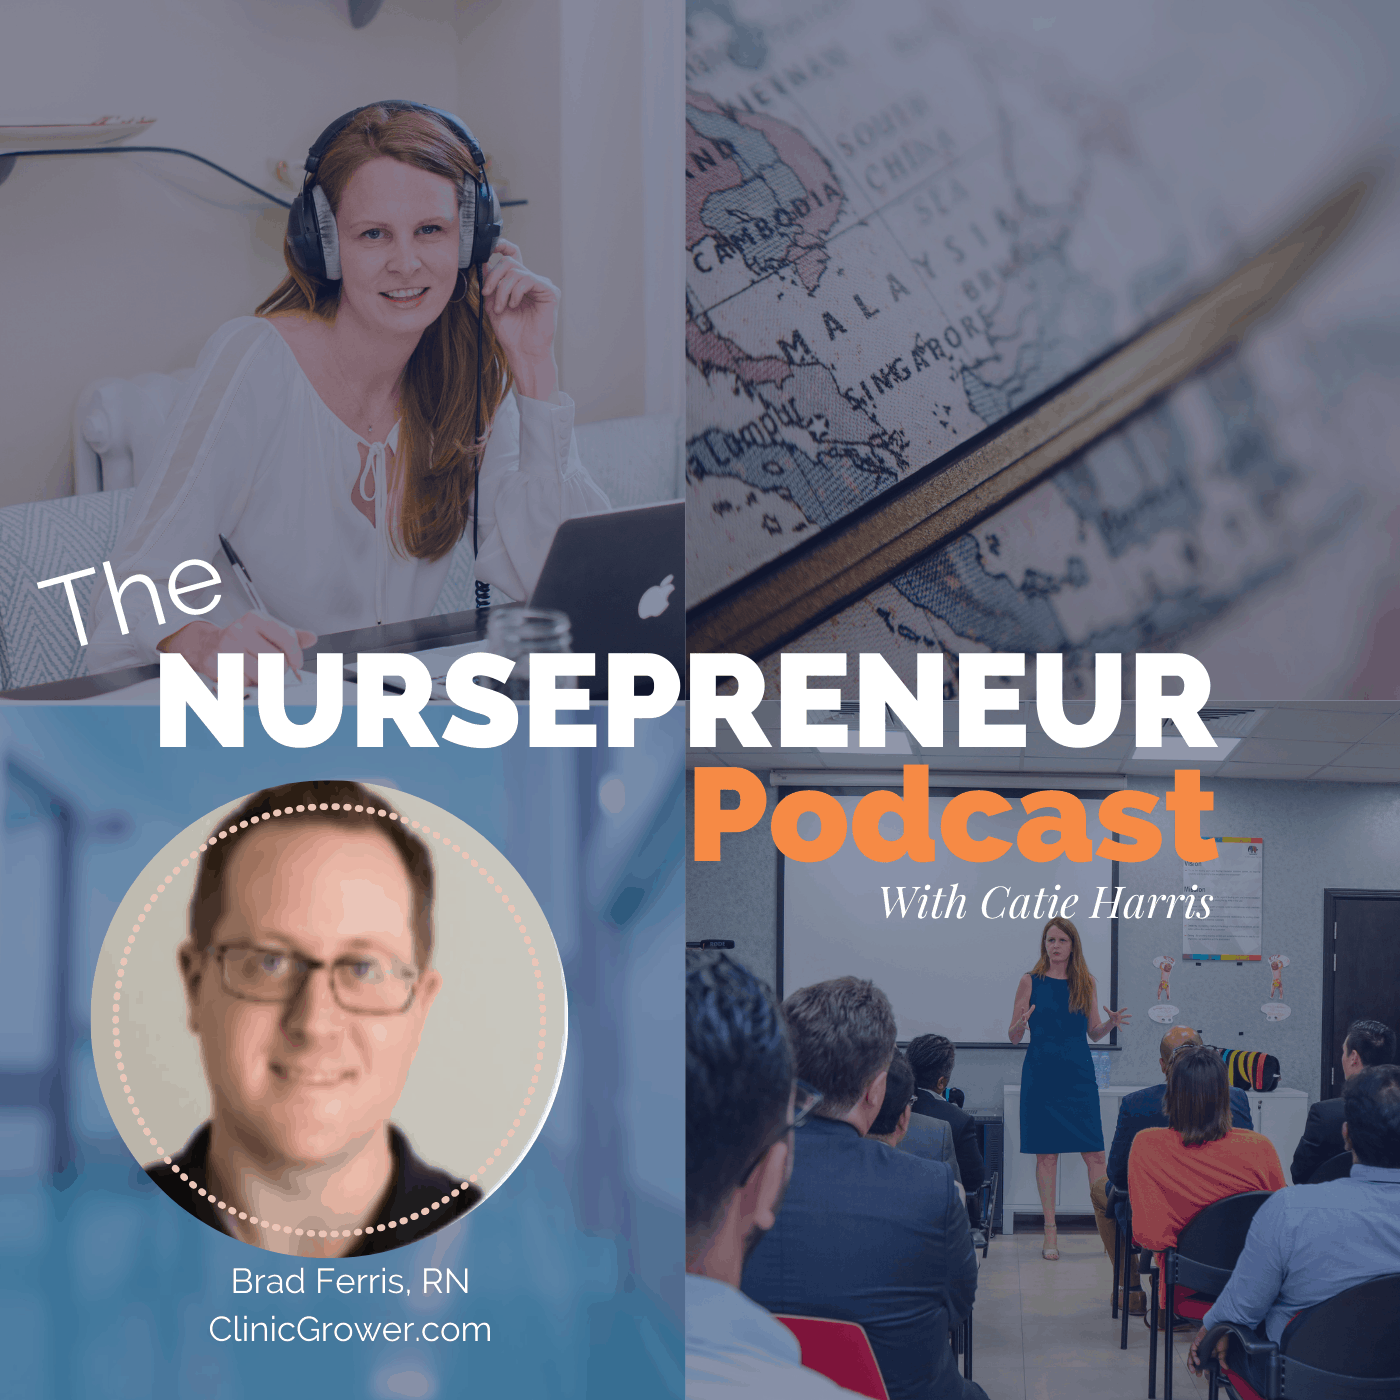 Artificial Intelligence Conversations NursePreneur Podcast